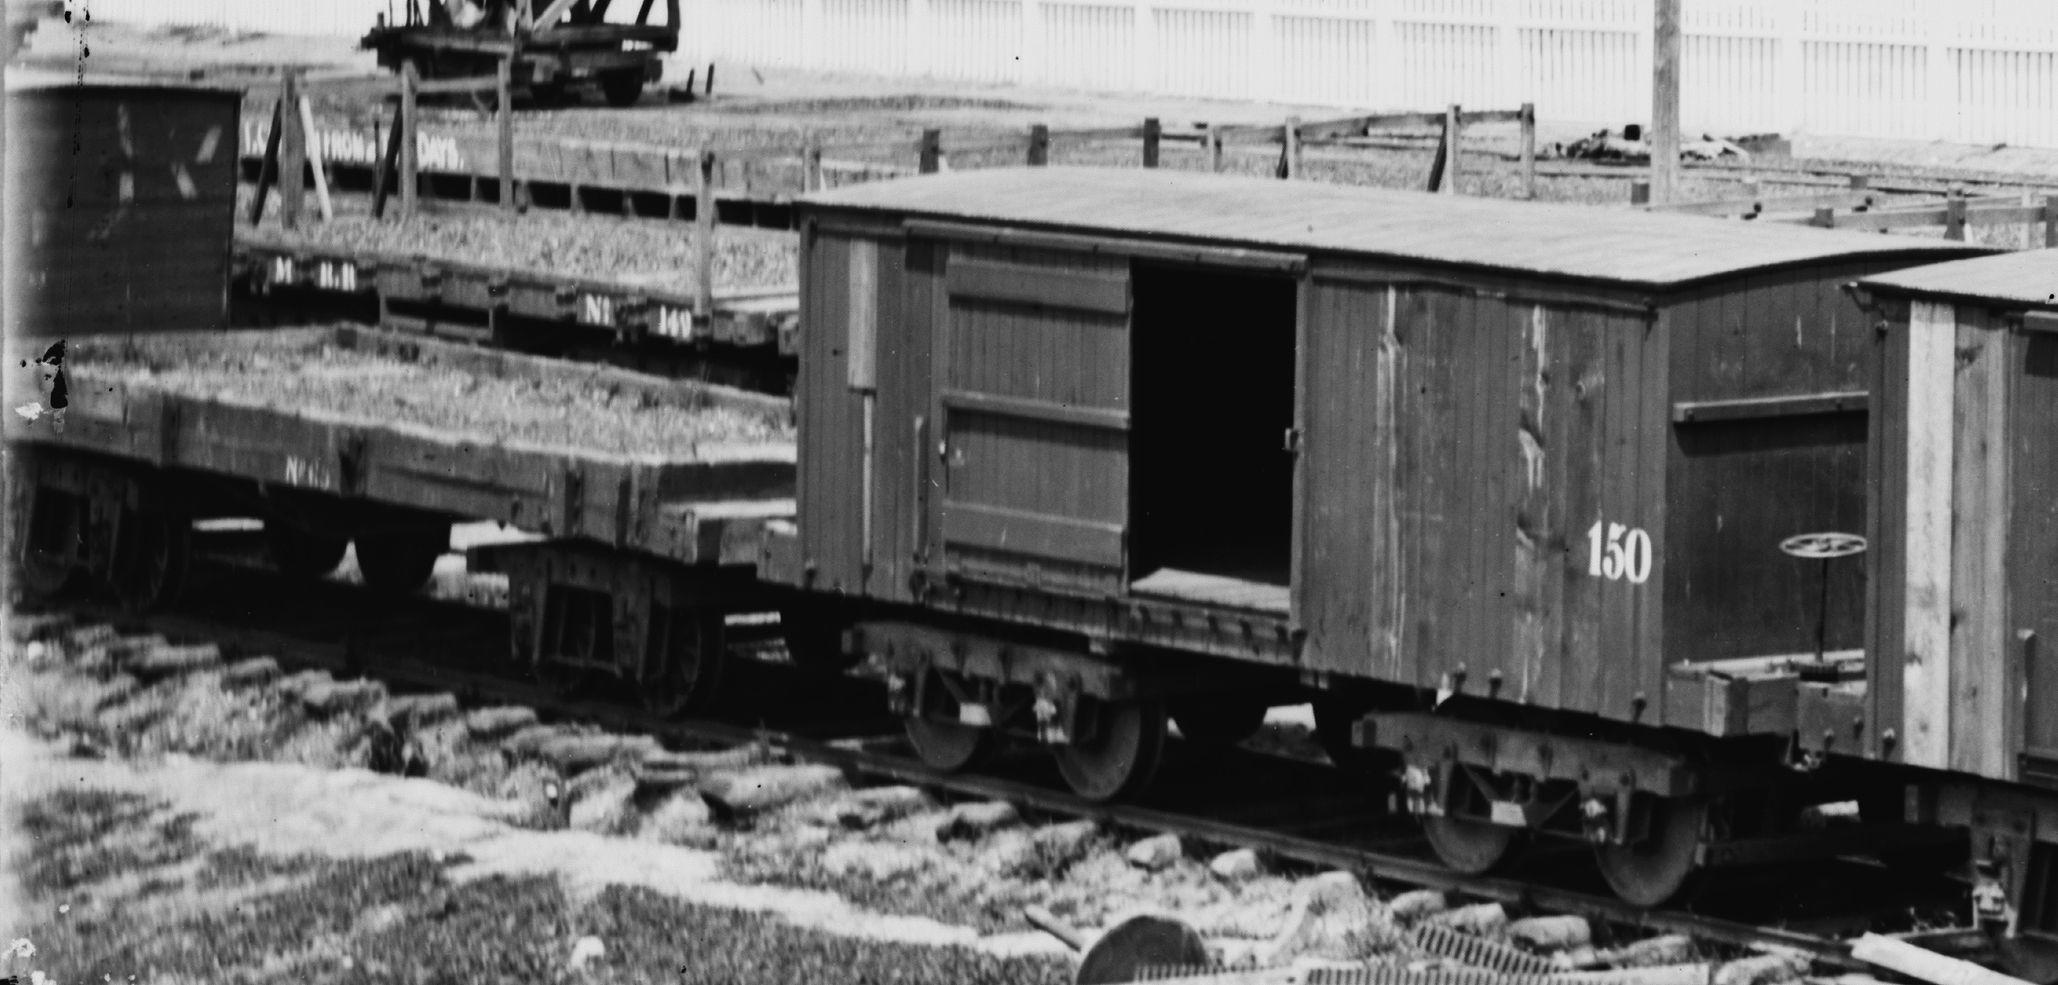 Typical Flat Car And House Car Civil War Model Railroad Ho Scale Train Layout